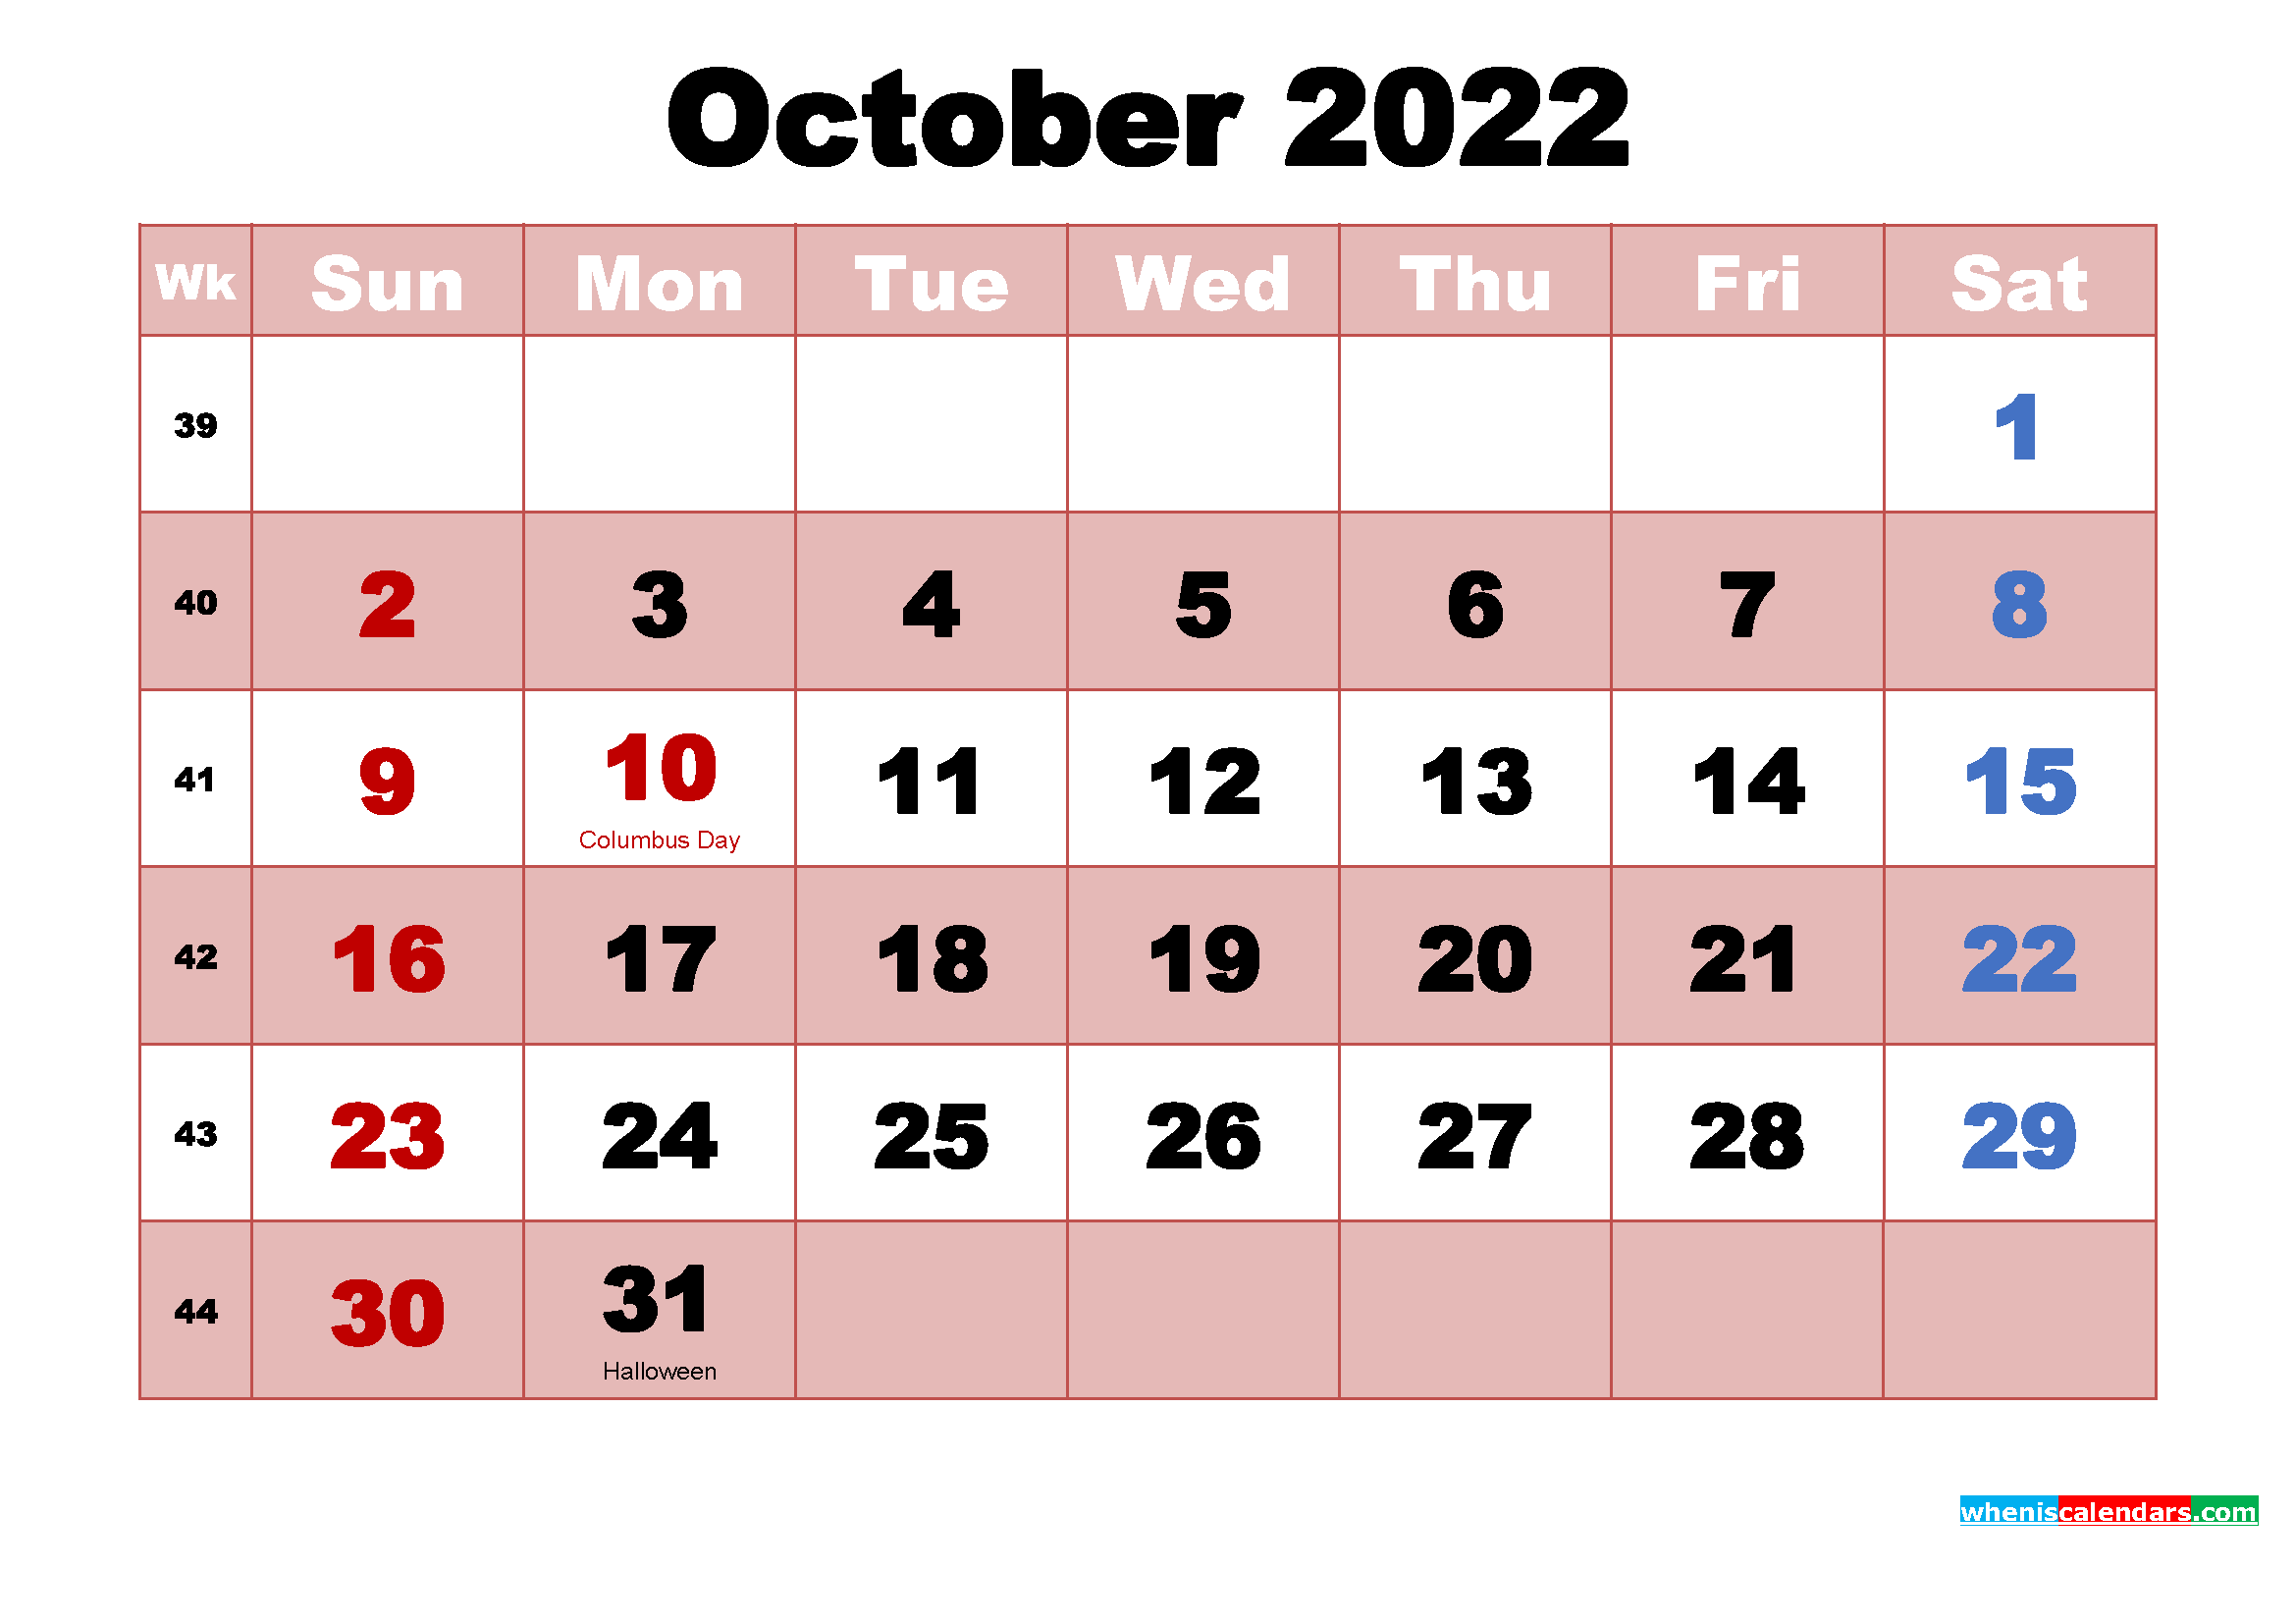 October 2022 Calendar with Holidays Wallpaper